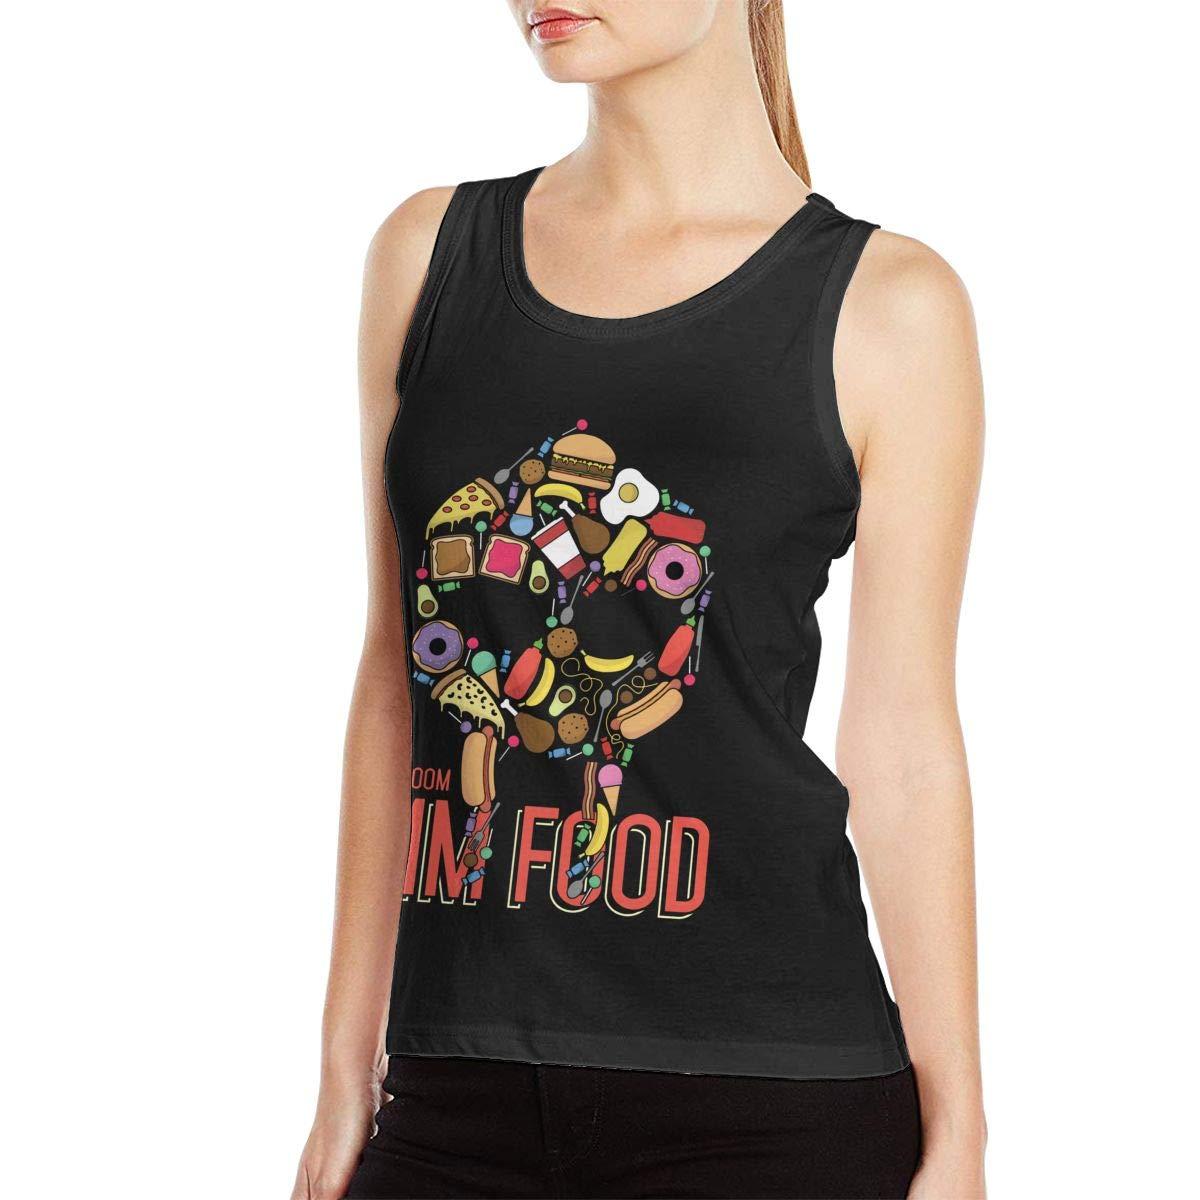 Melissa J Hagen Mf Doom Shirt Tank Top Casual Sleeveles Tee